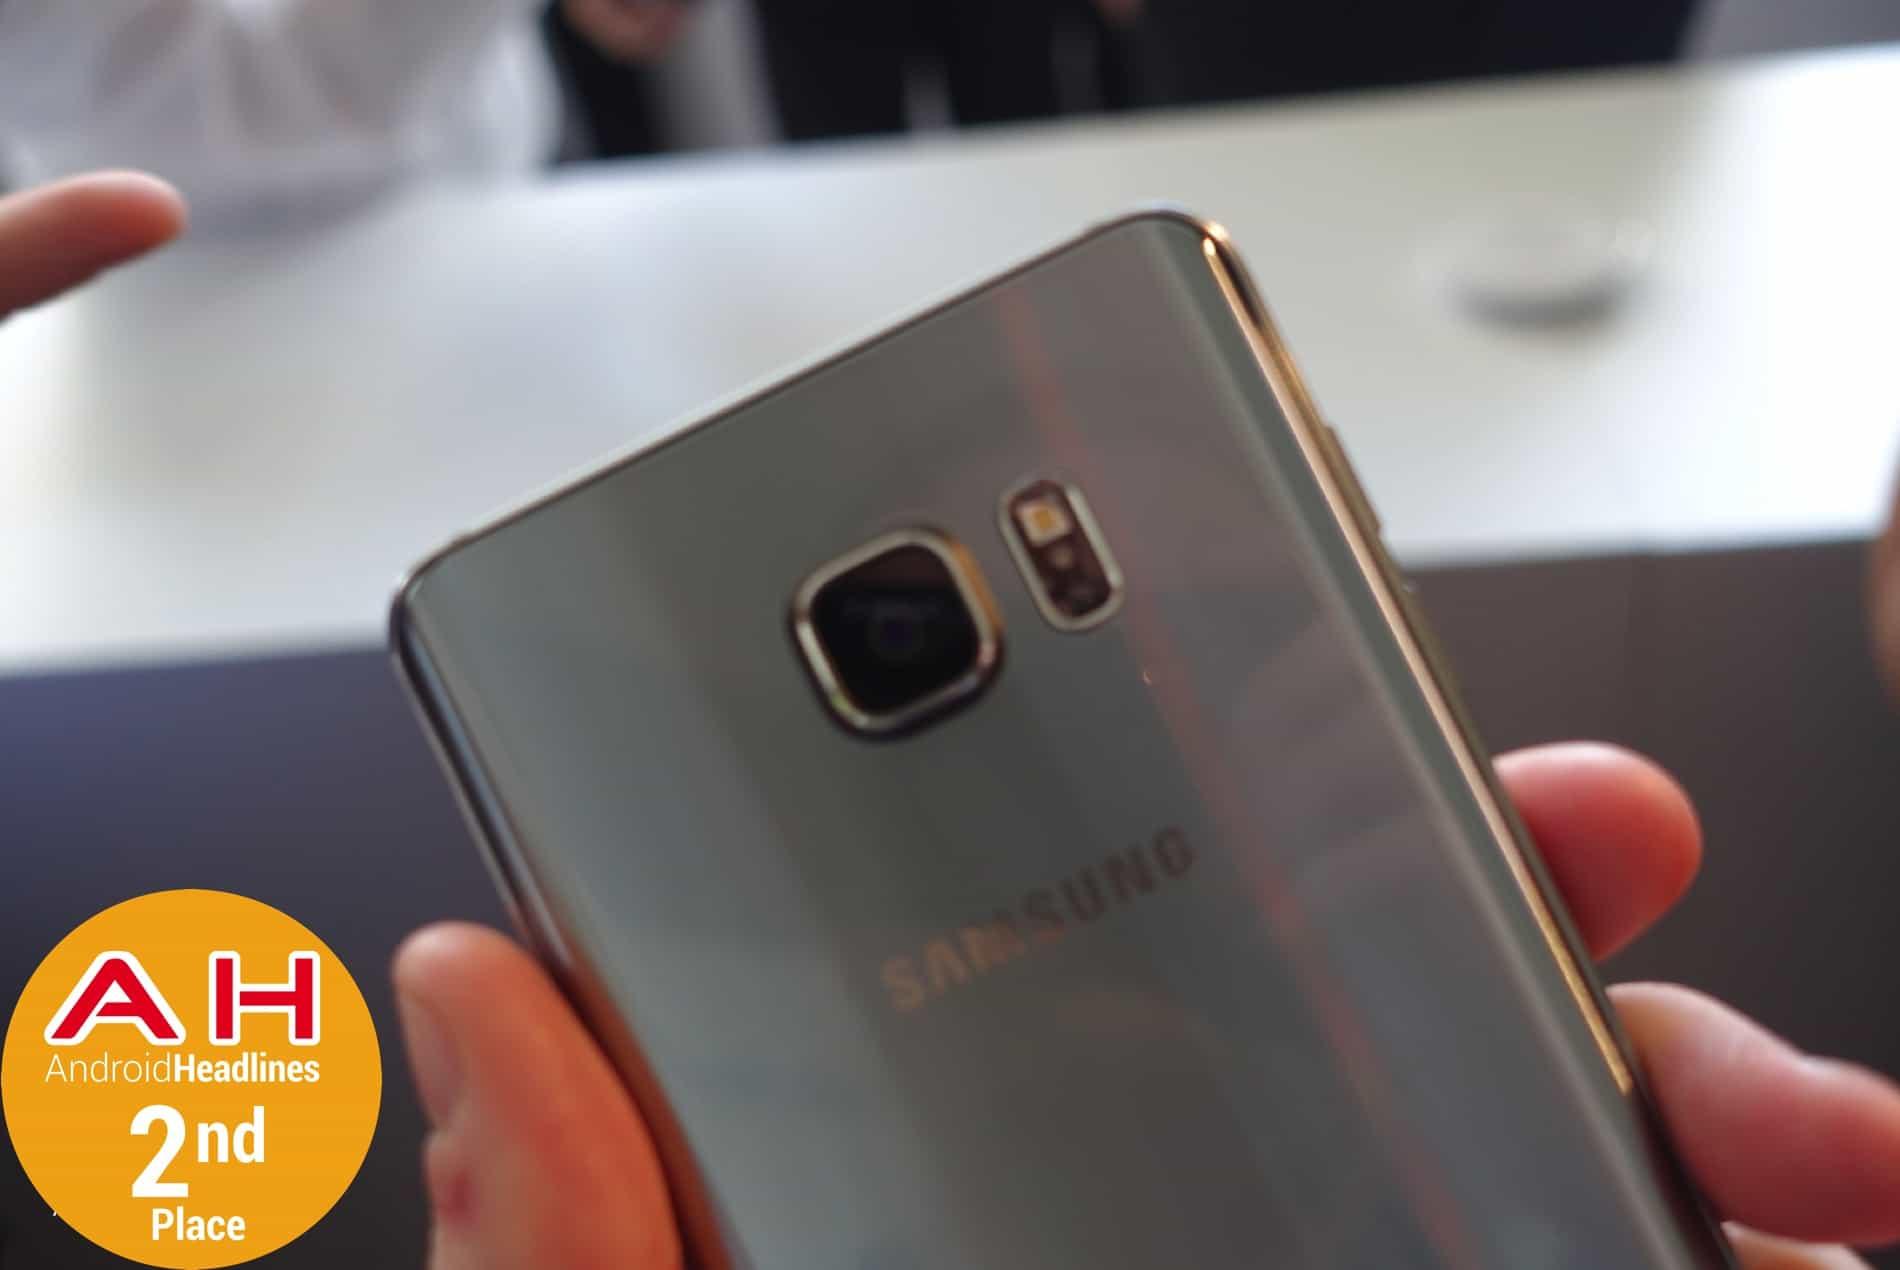 Galaxy Note 5 2nd Place 2015